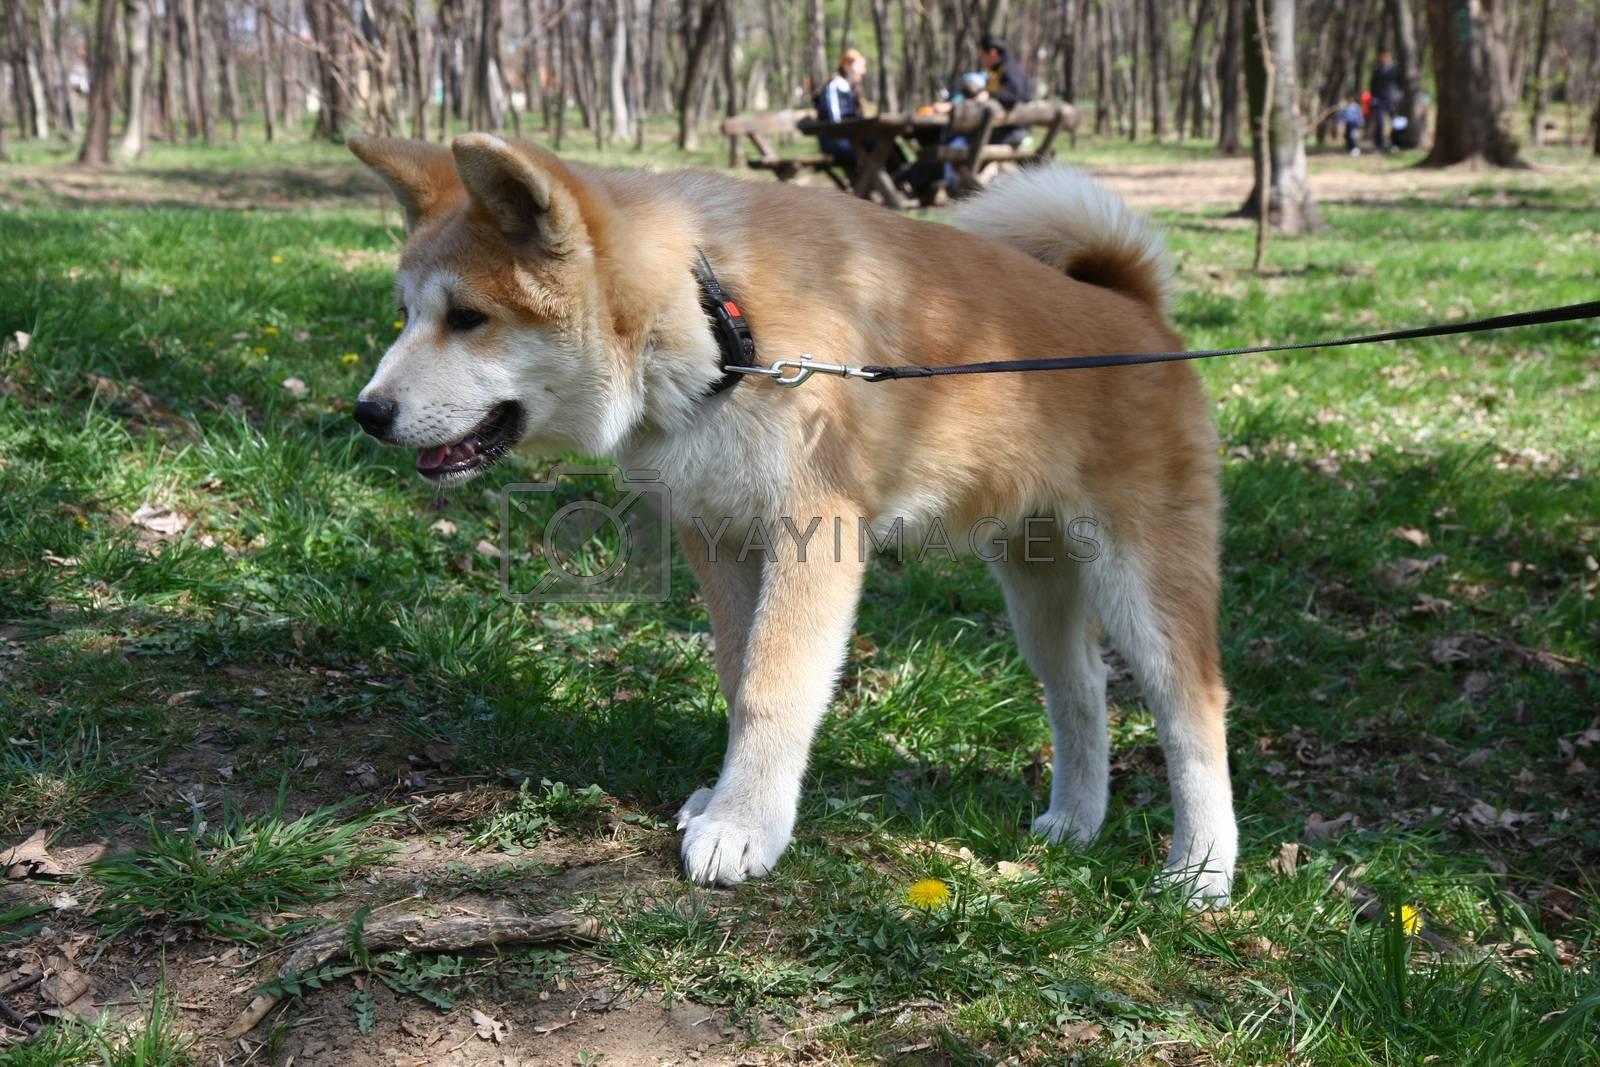 Curious Akita Inu puppy walking in public park